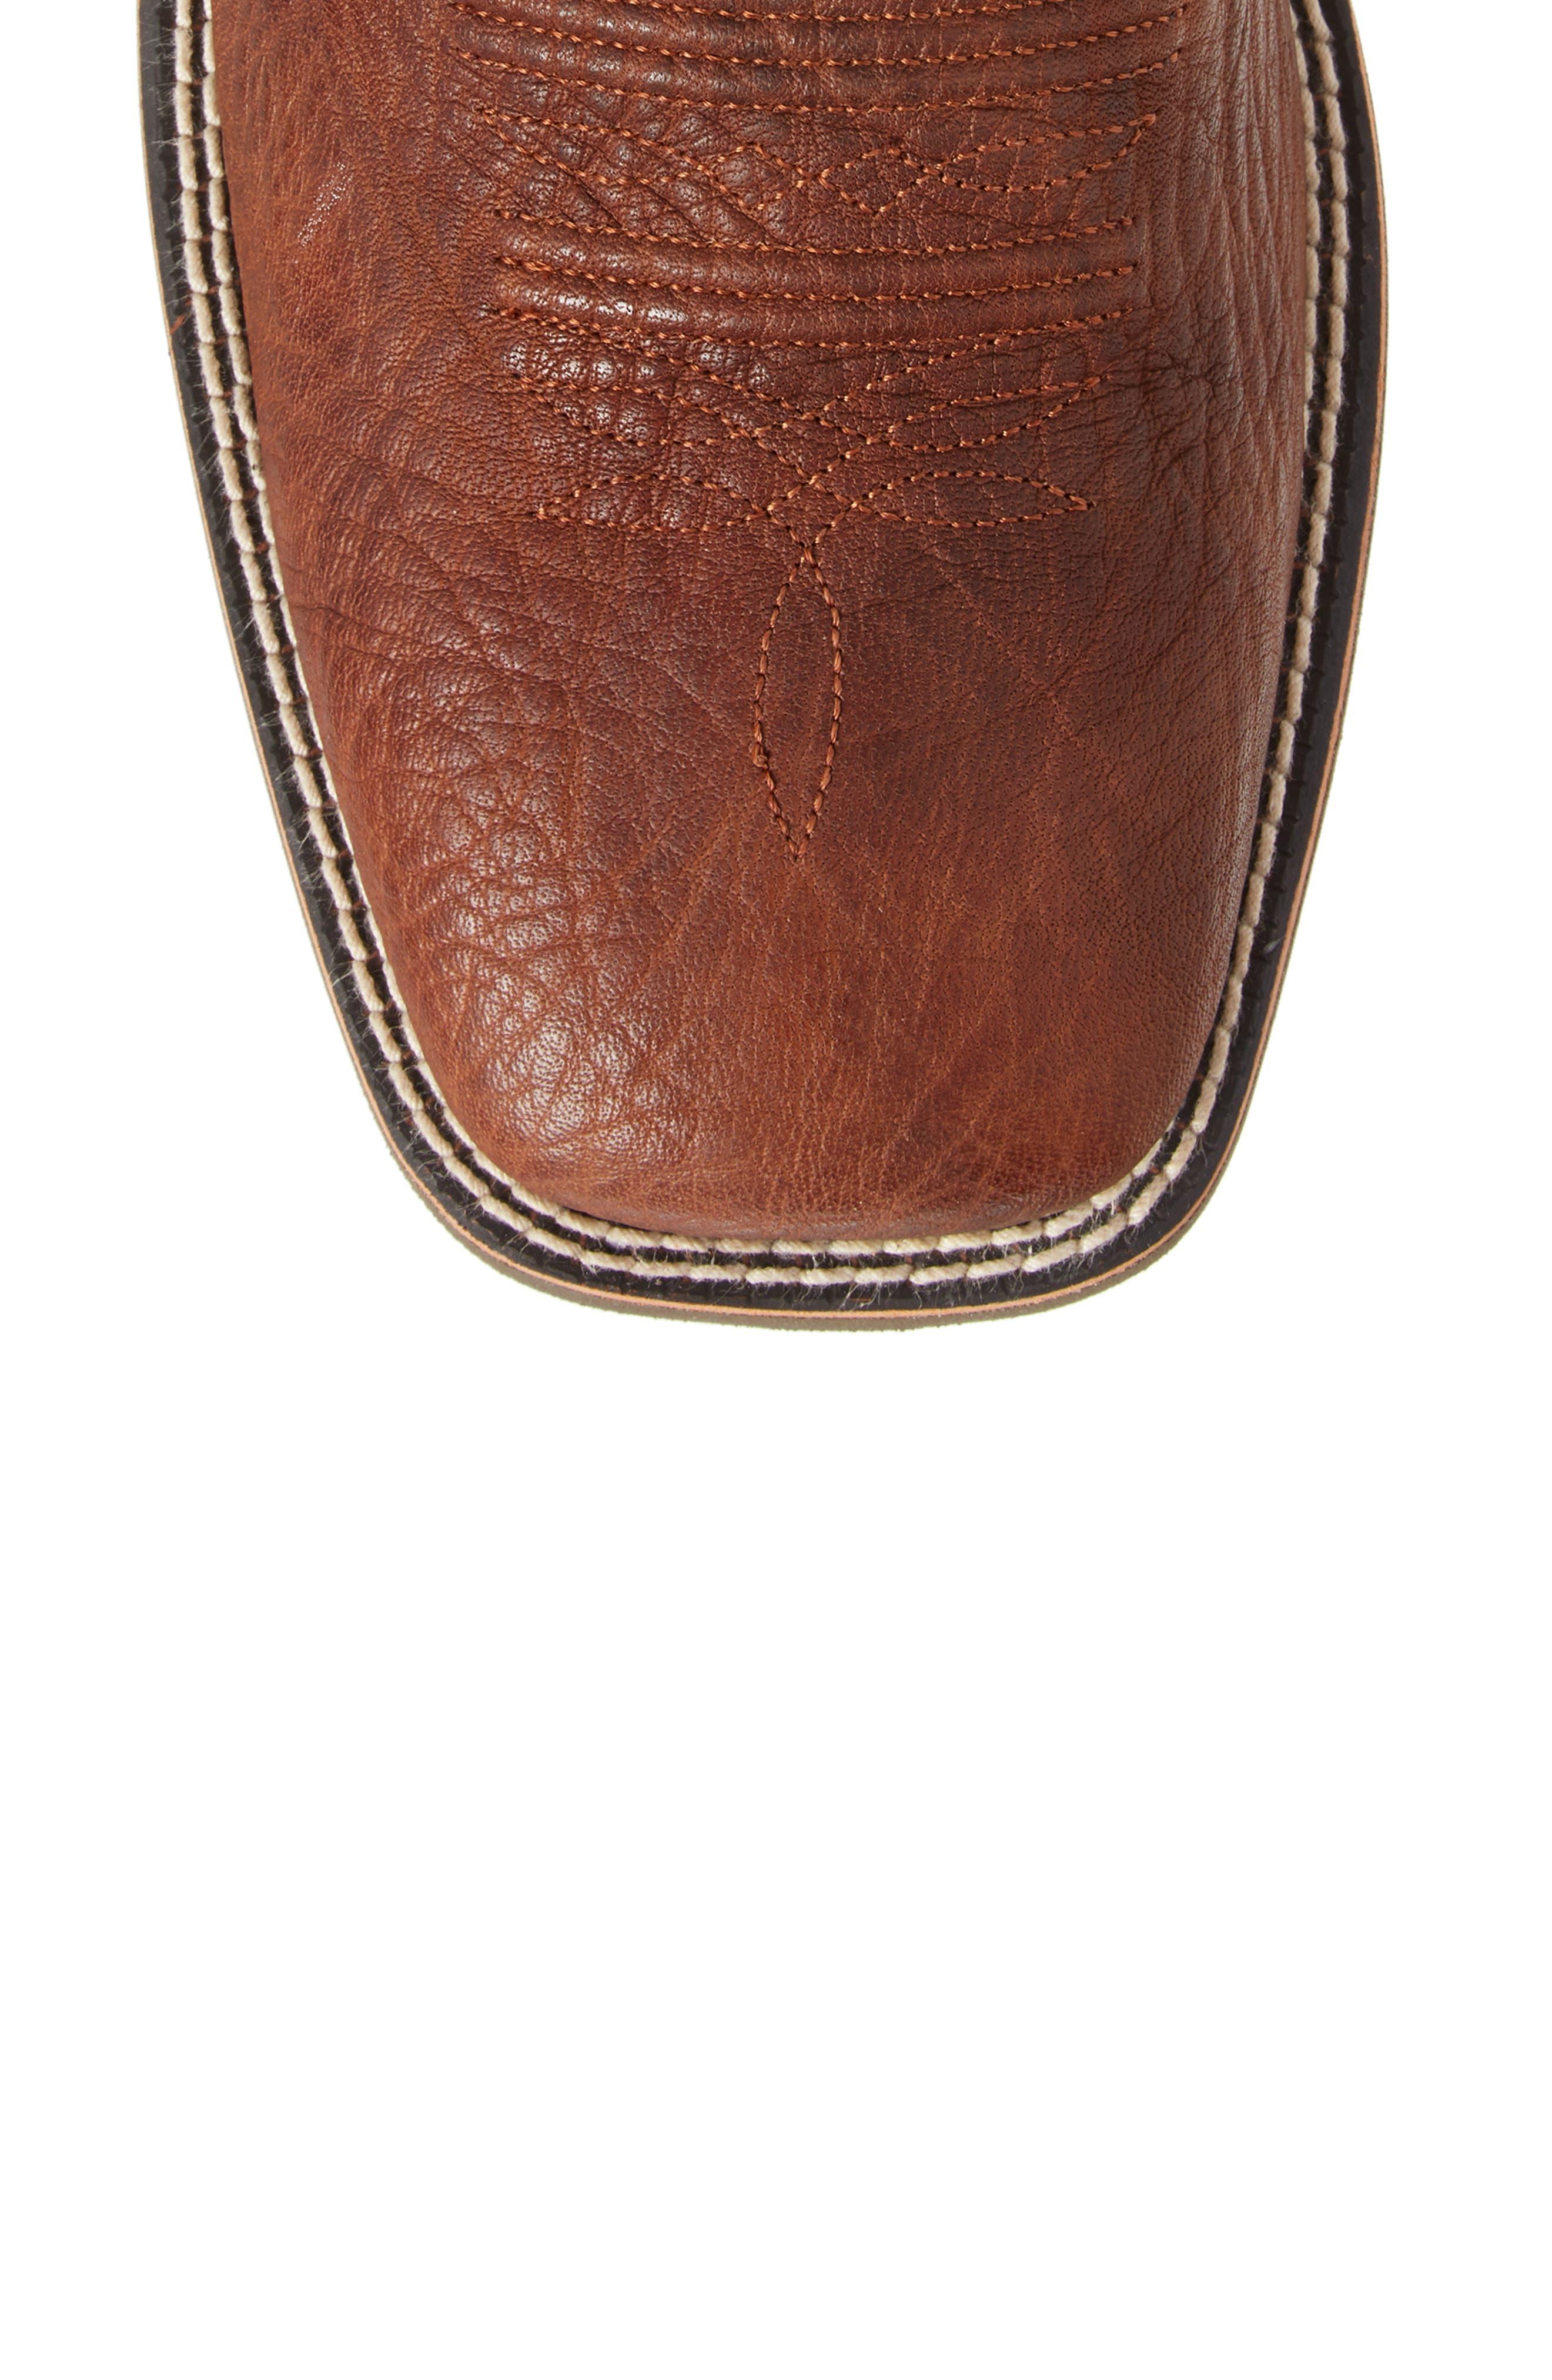 Heritage Latigo Square Toe Cowboy Boot,                             Alternate thumbnail 5, color,                             COGNAC/ BROWN BOMBER LEATHER